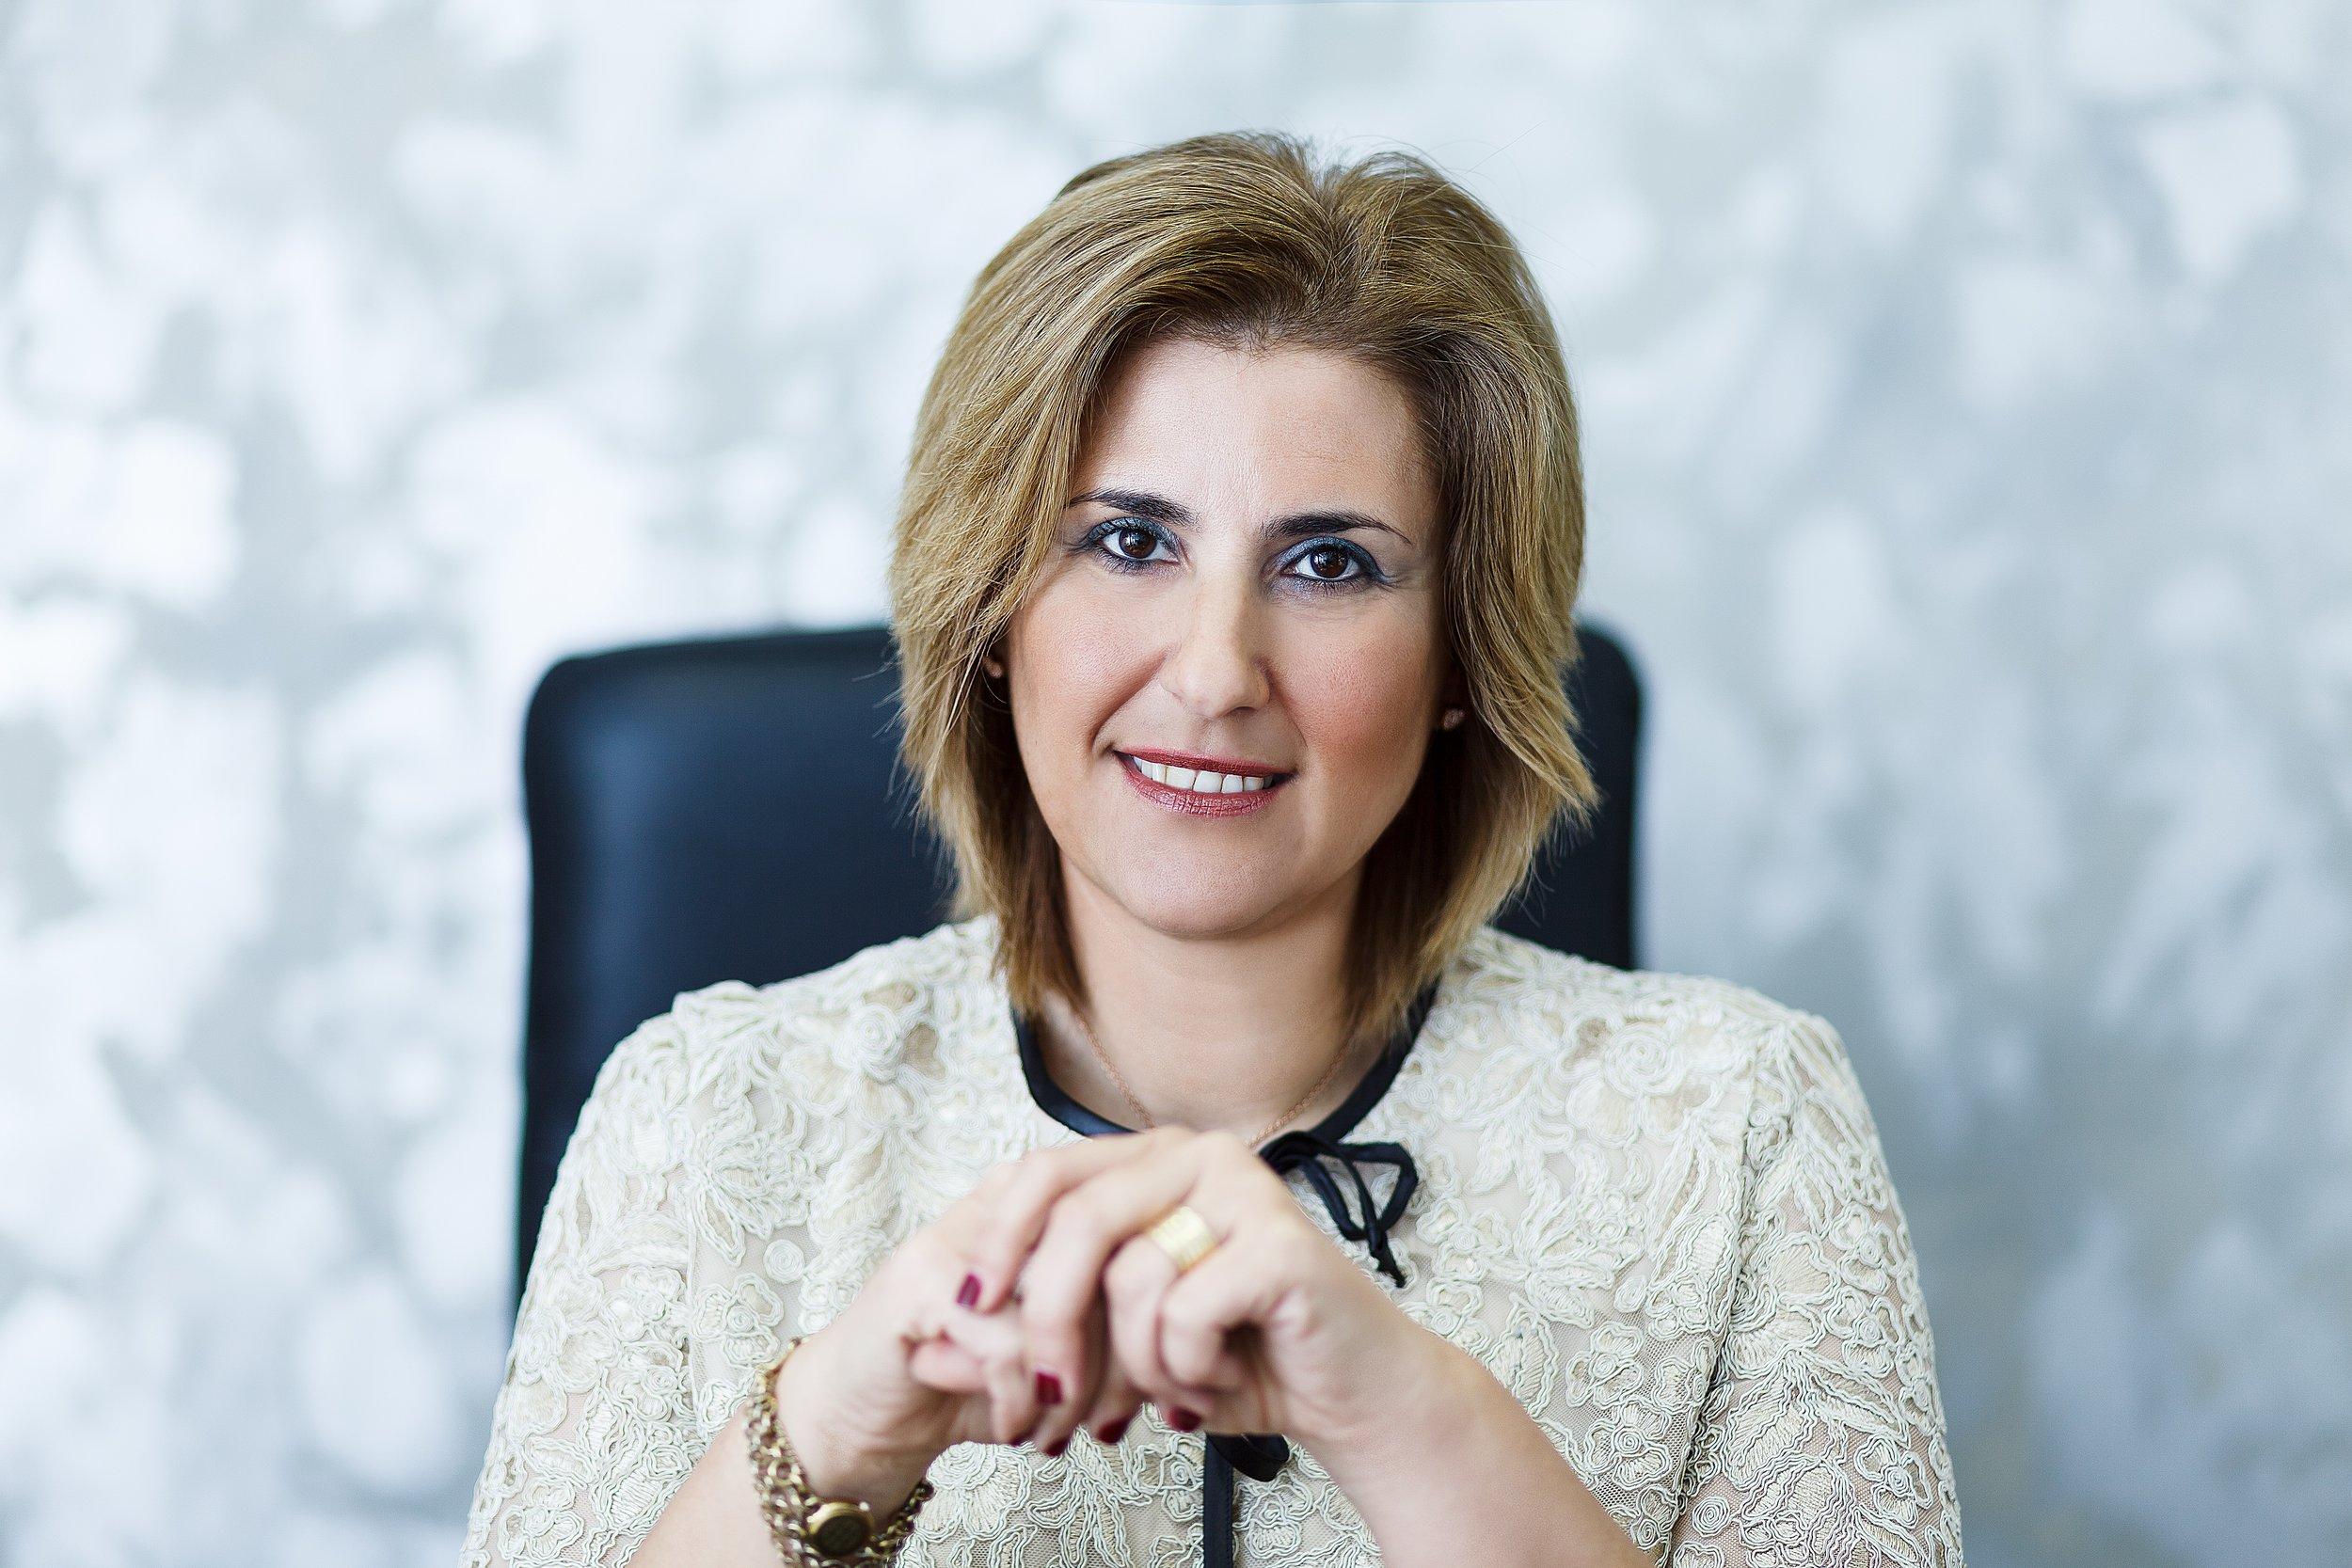 Rebecca Pitsika